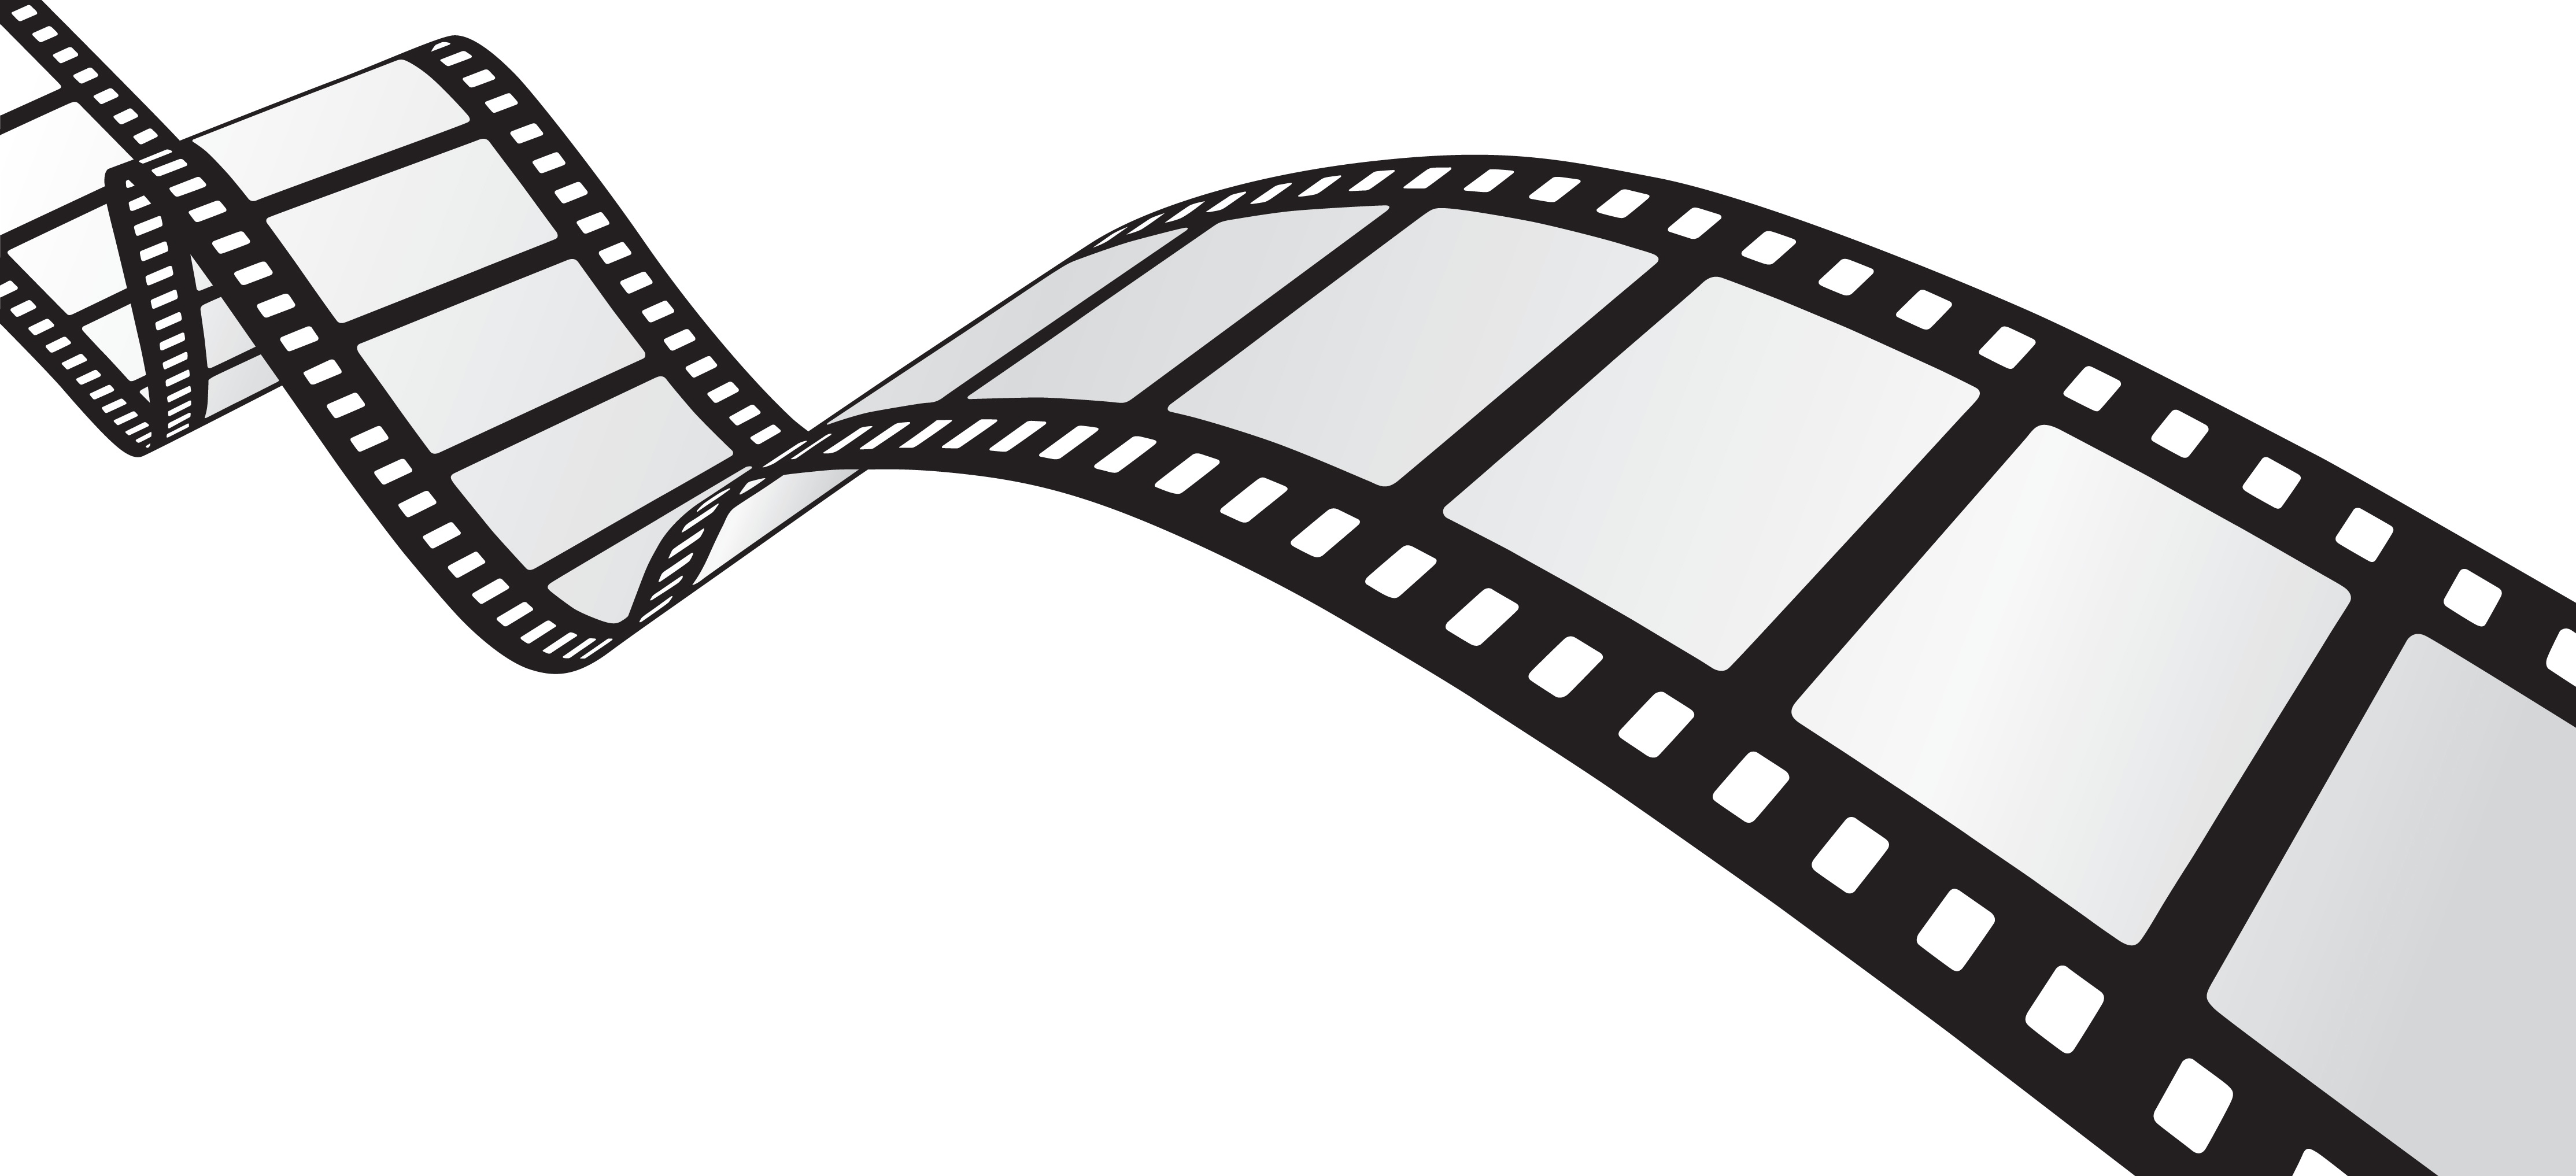 Movie reel movie film strip clip art image 3